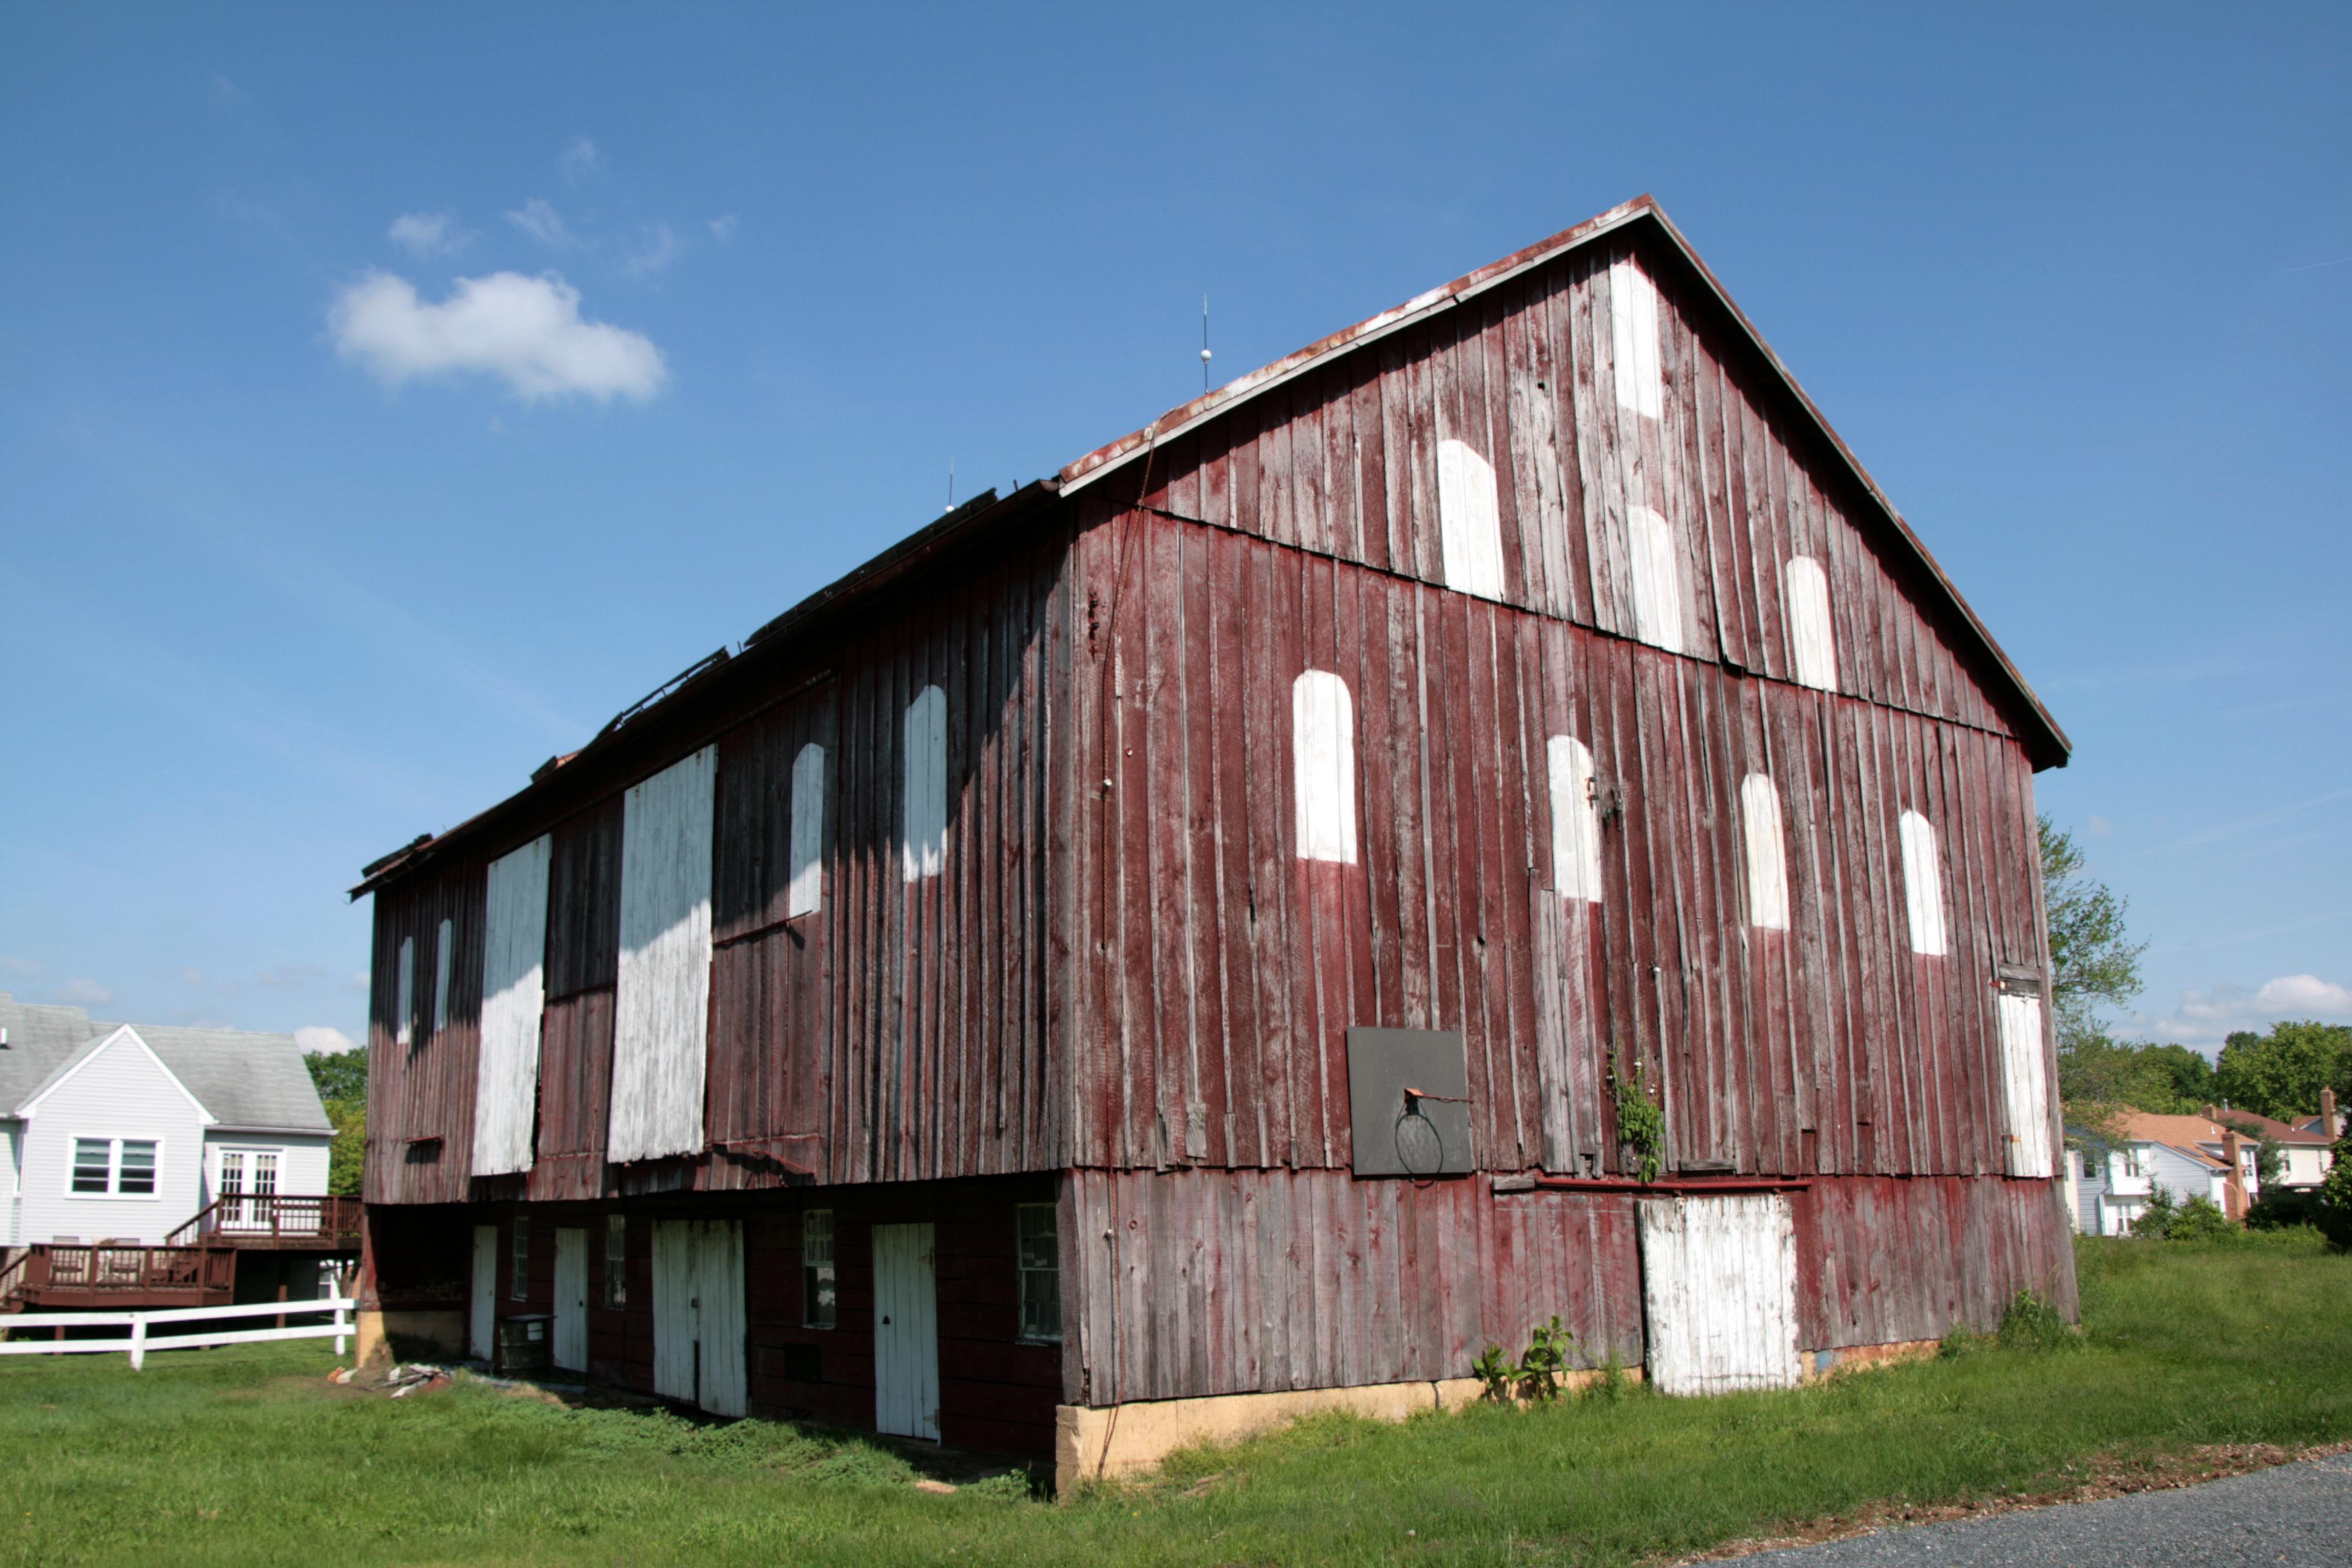 Preservation Maryland | Saving and Reusing Historic Barns in